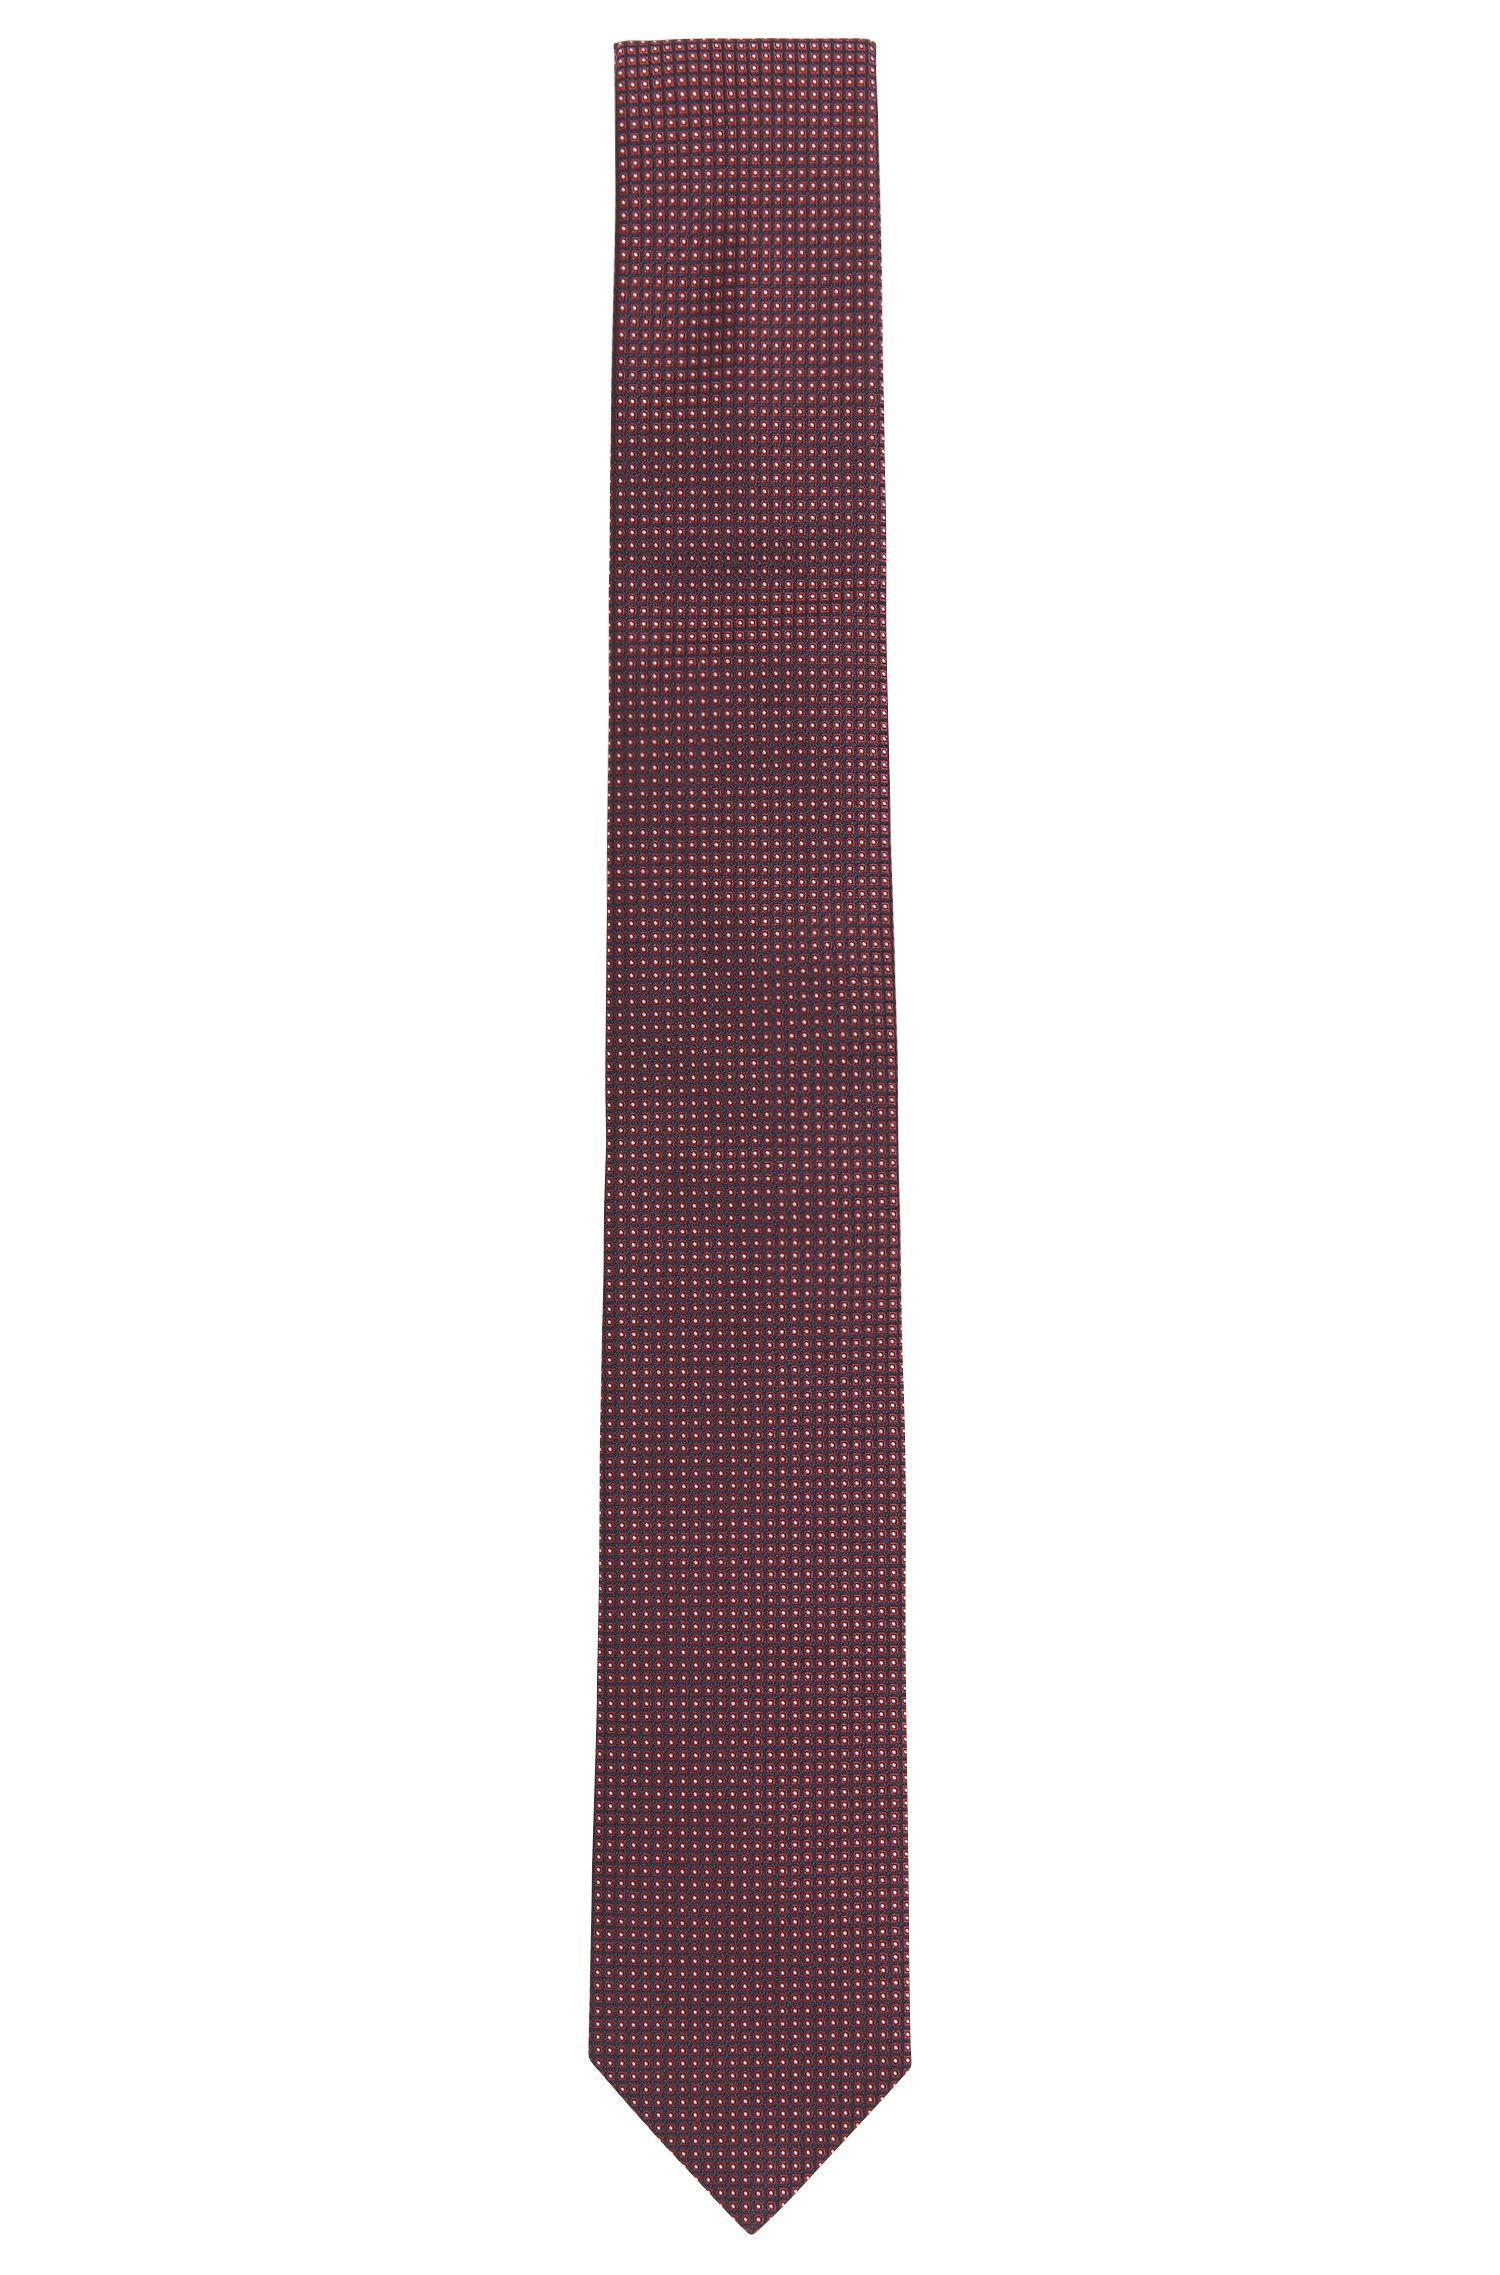 Square-patterned tie in fine silk jacquard